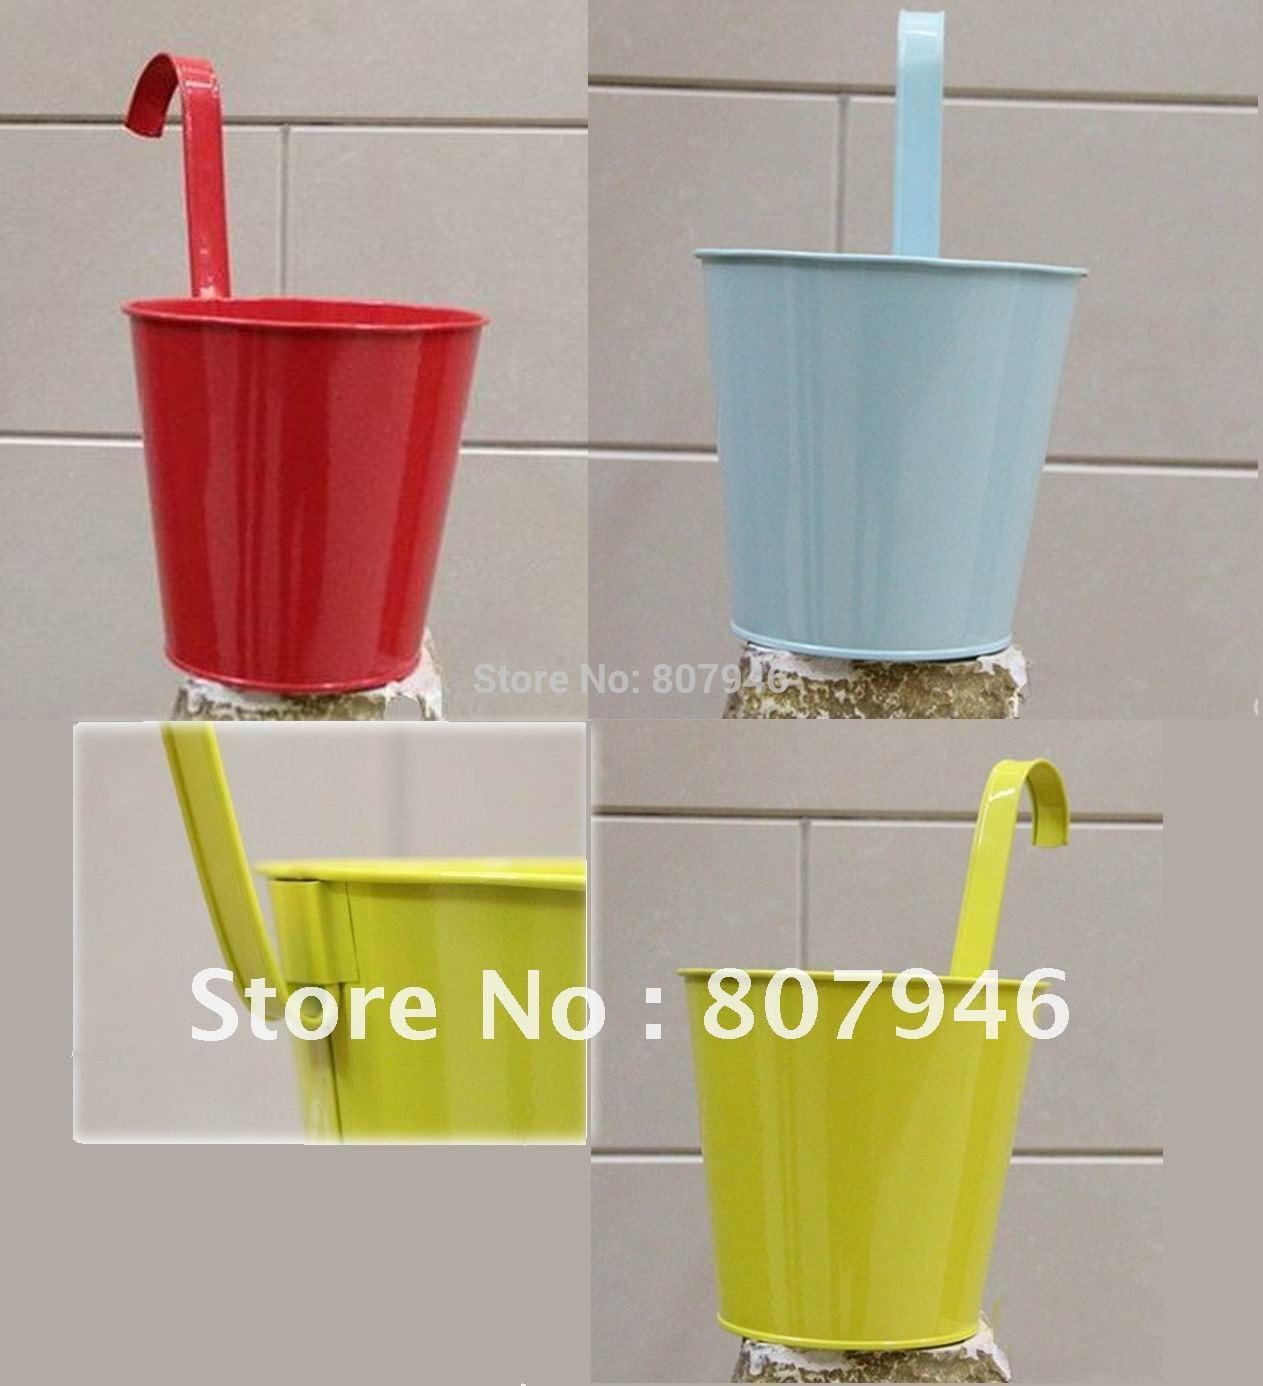 Compare Outdoor Decorative Plant Pots-Source Outdoor Decorative ...